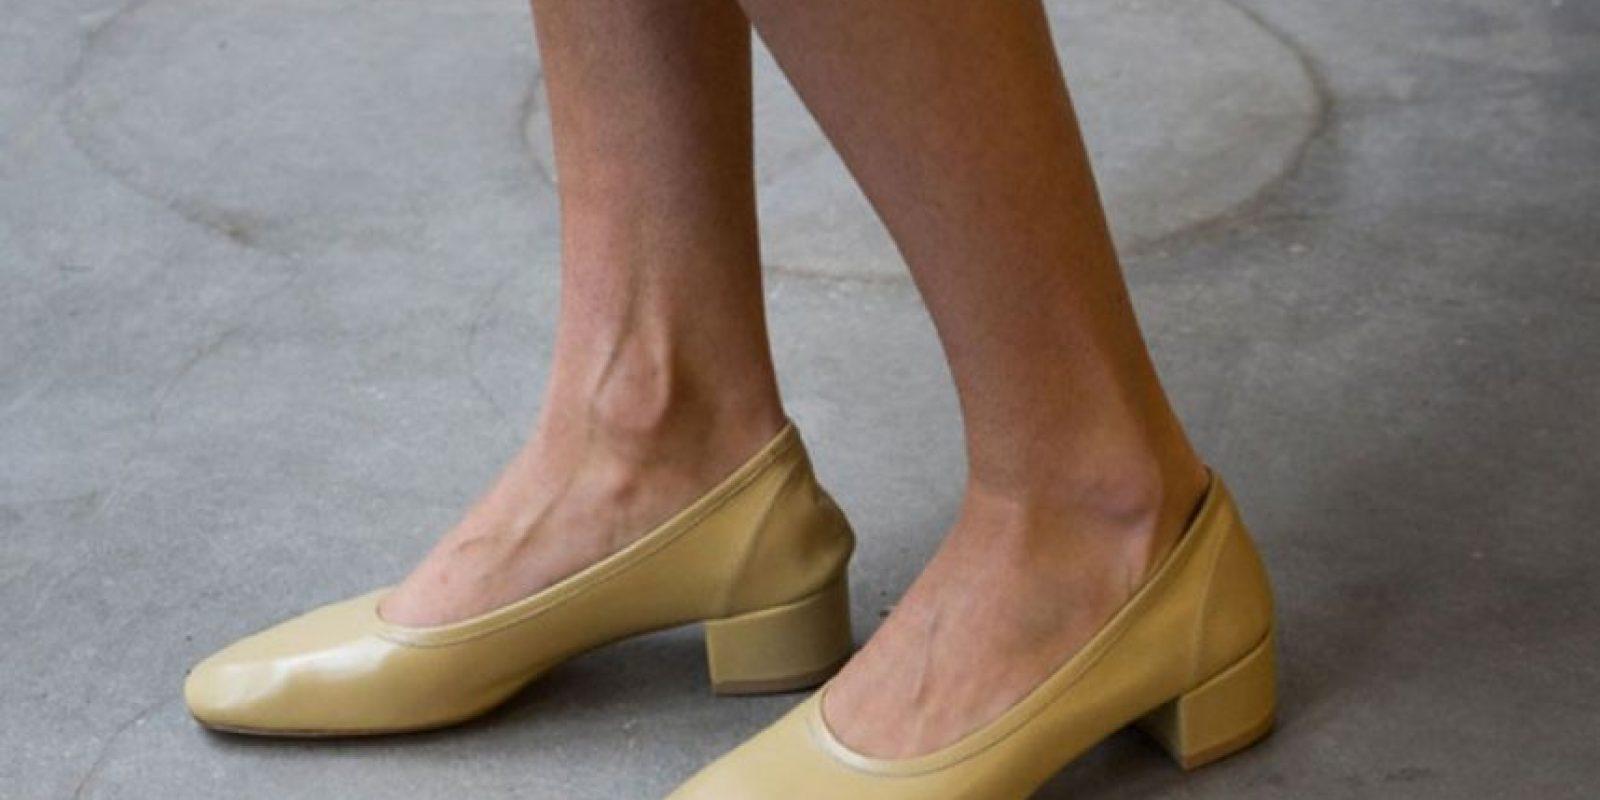 Zapatos marca Maryam Nassir Zadeh Foto:Maryam Nassir Zadeh